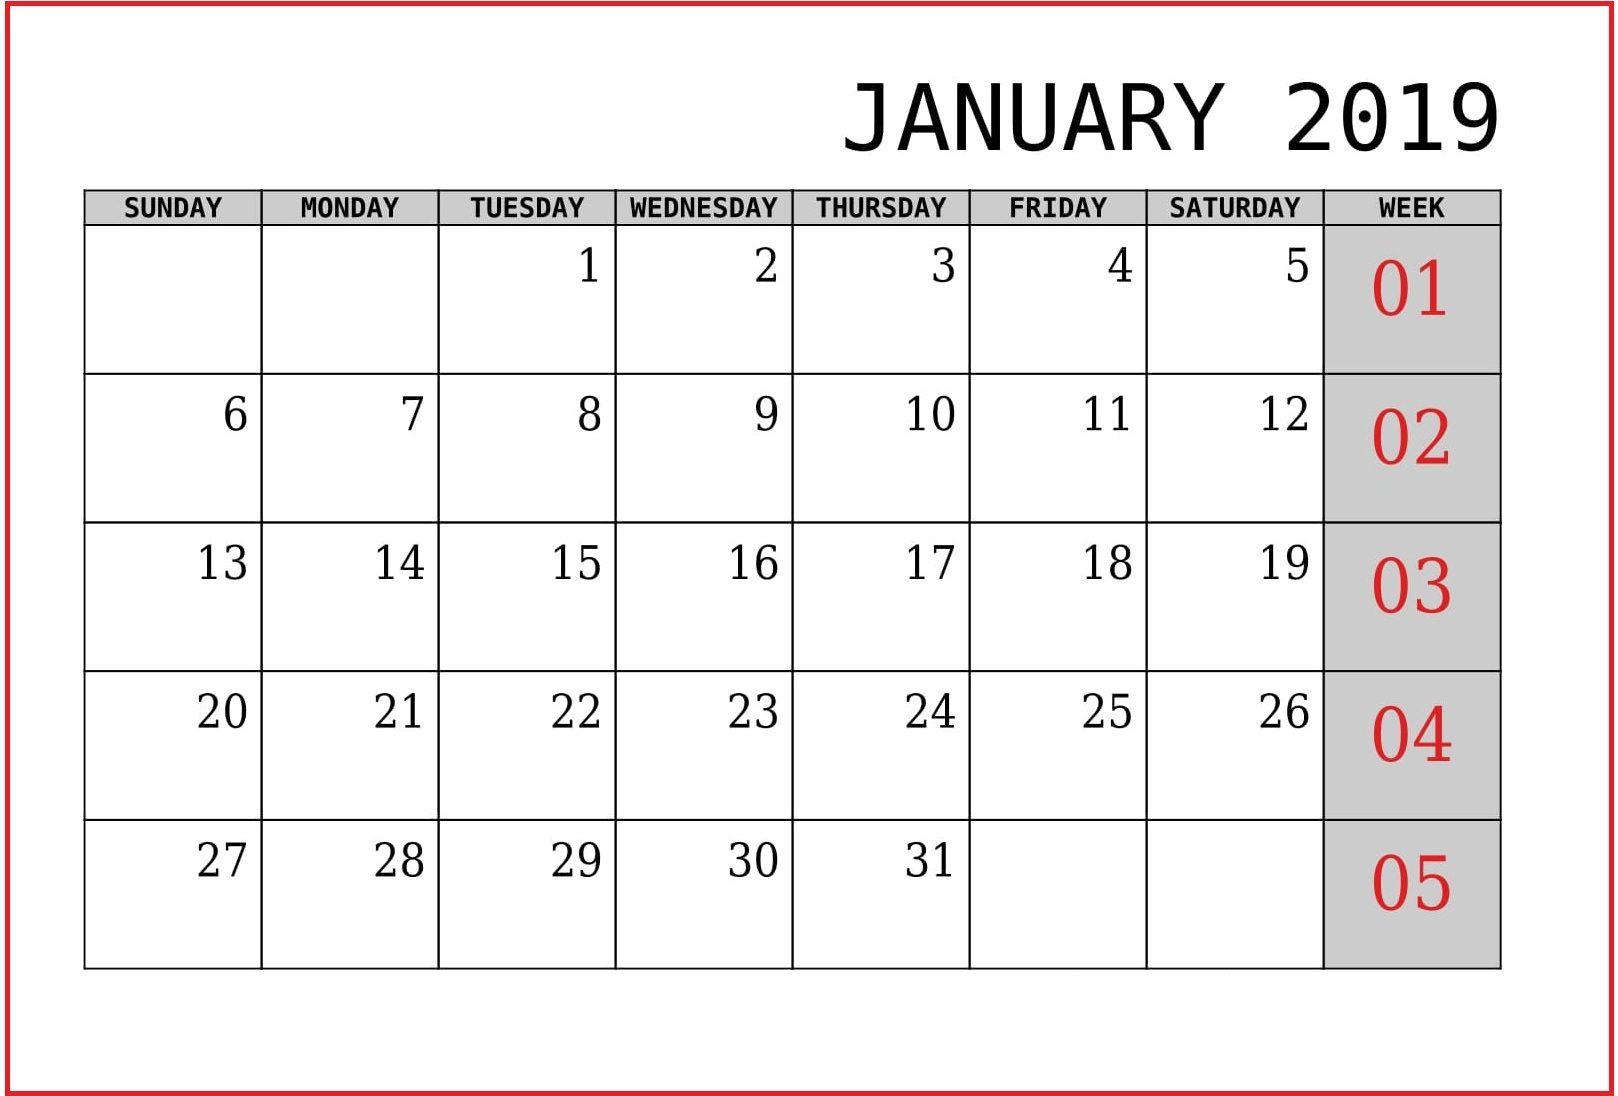 January 2019 Calendar Printable Landscape